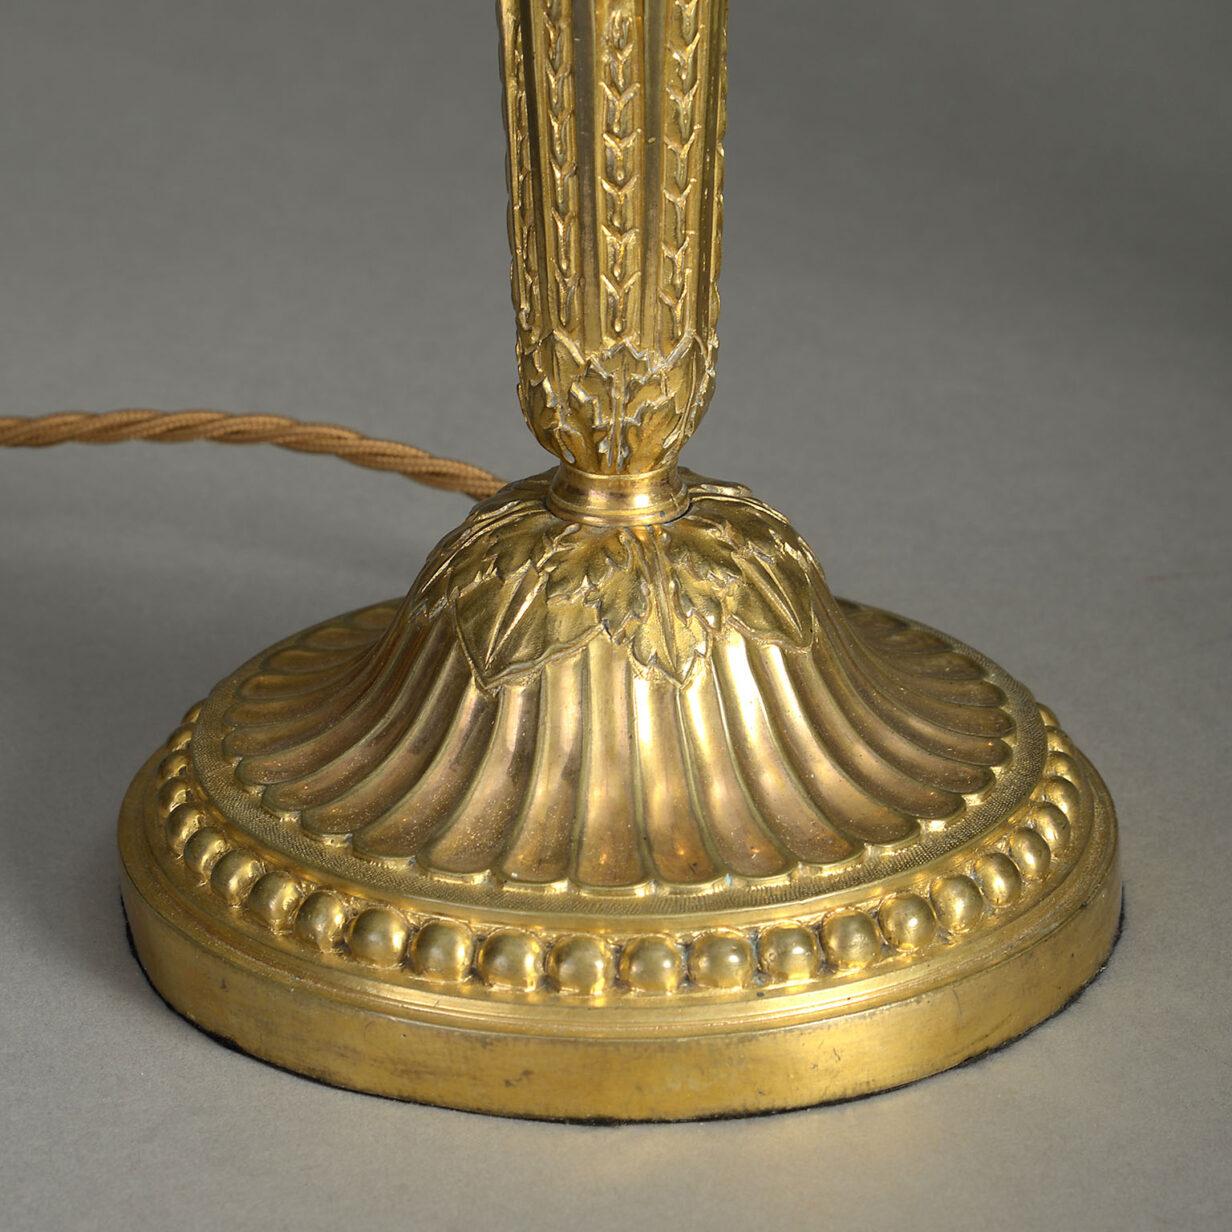 Pair of Louis XVI Ormolu Candlestick Lamps